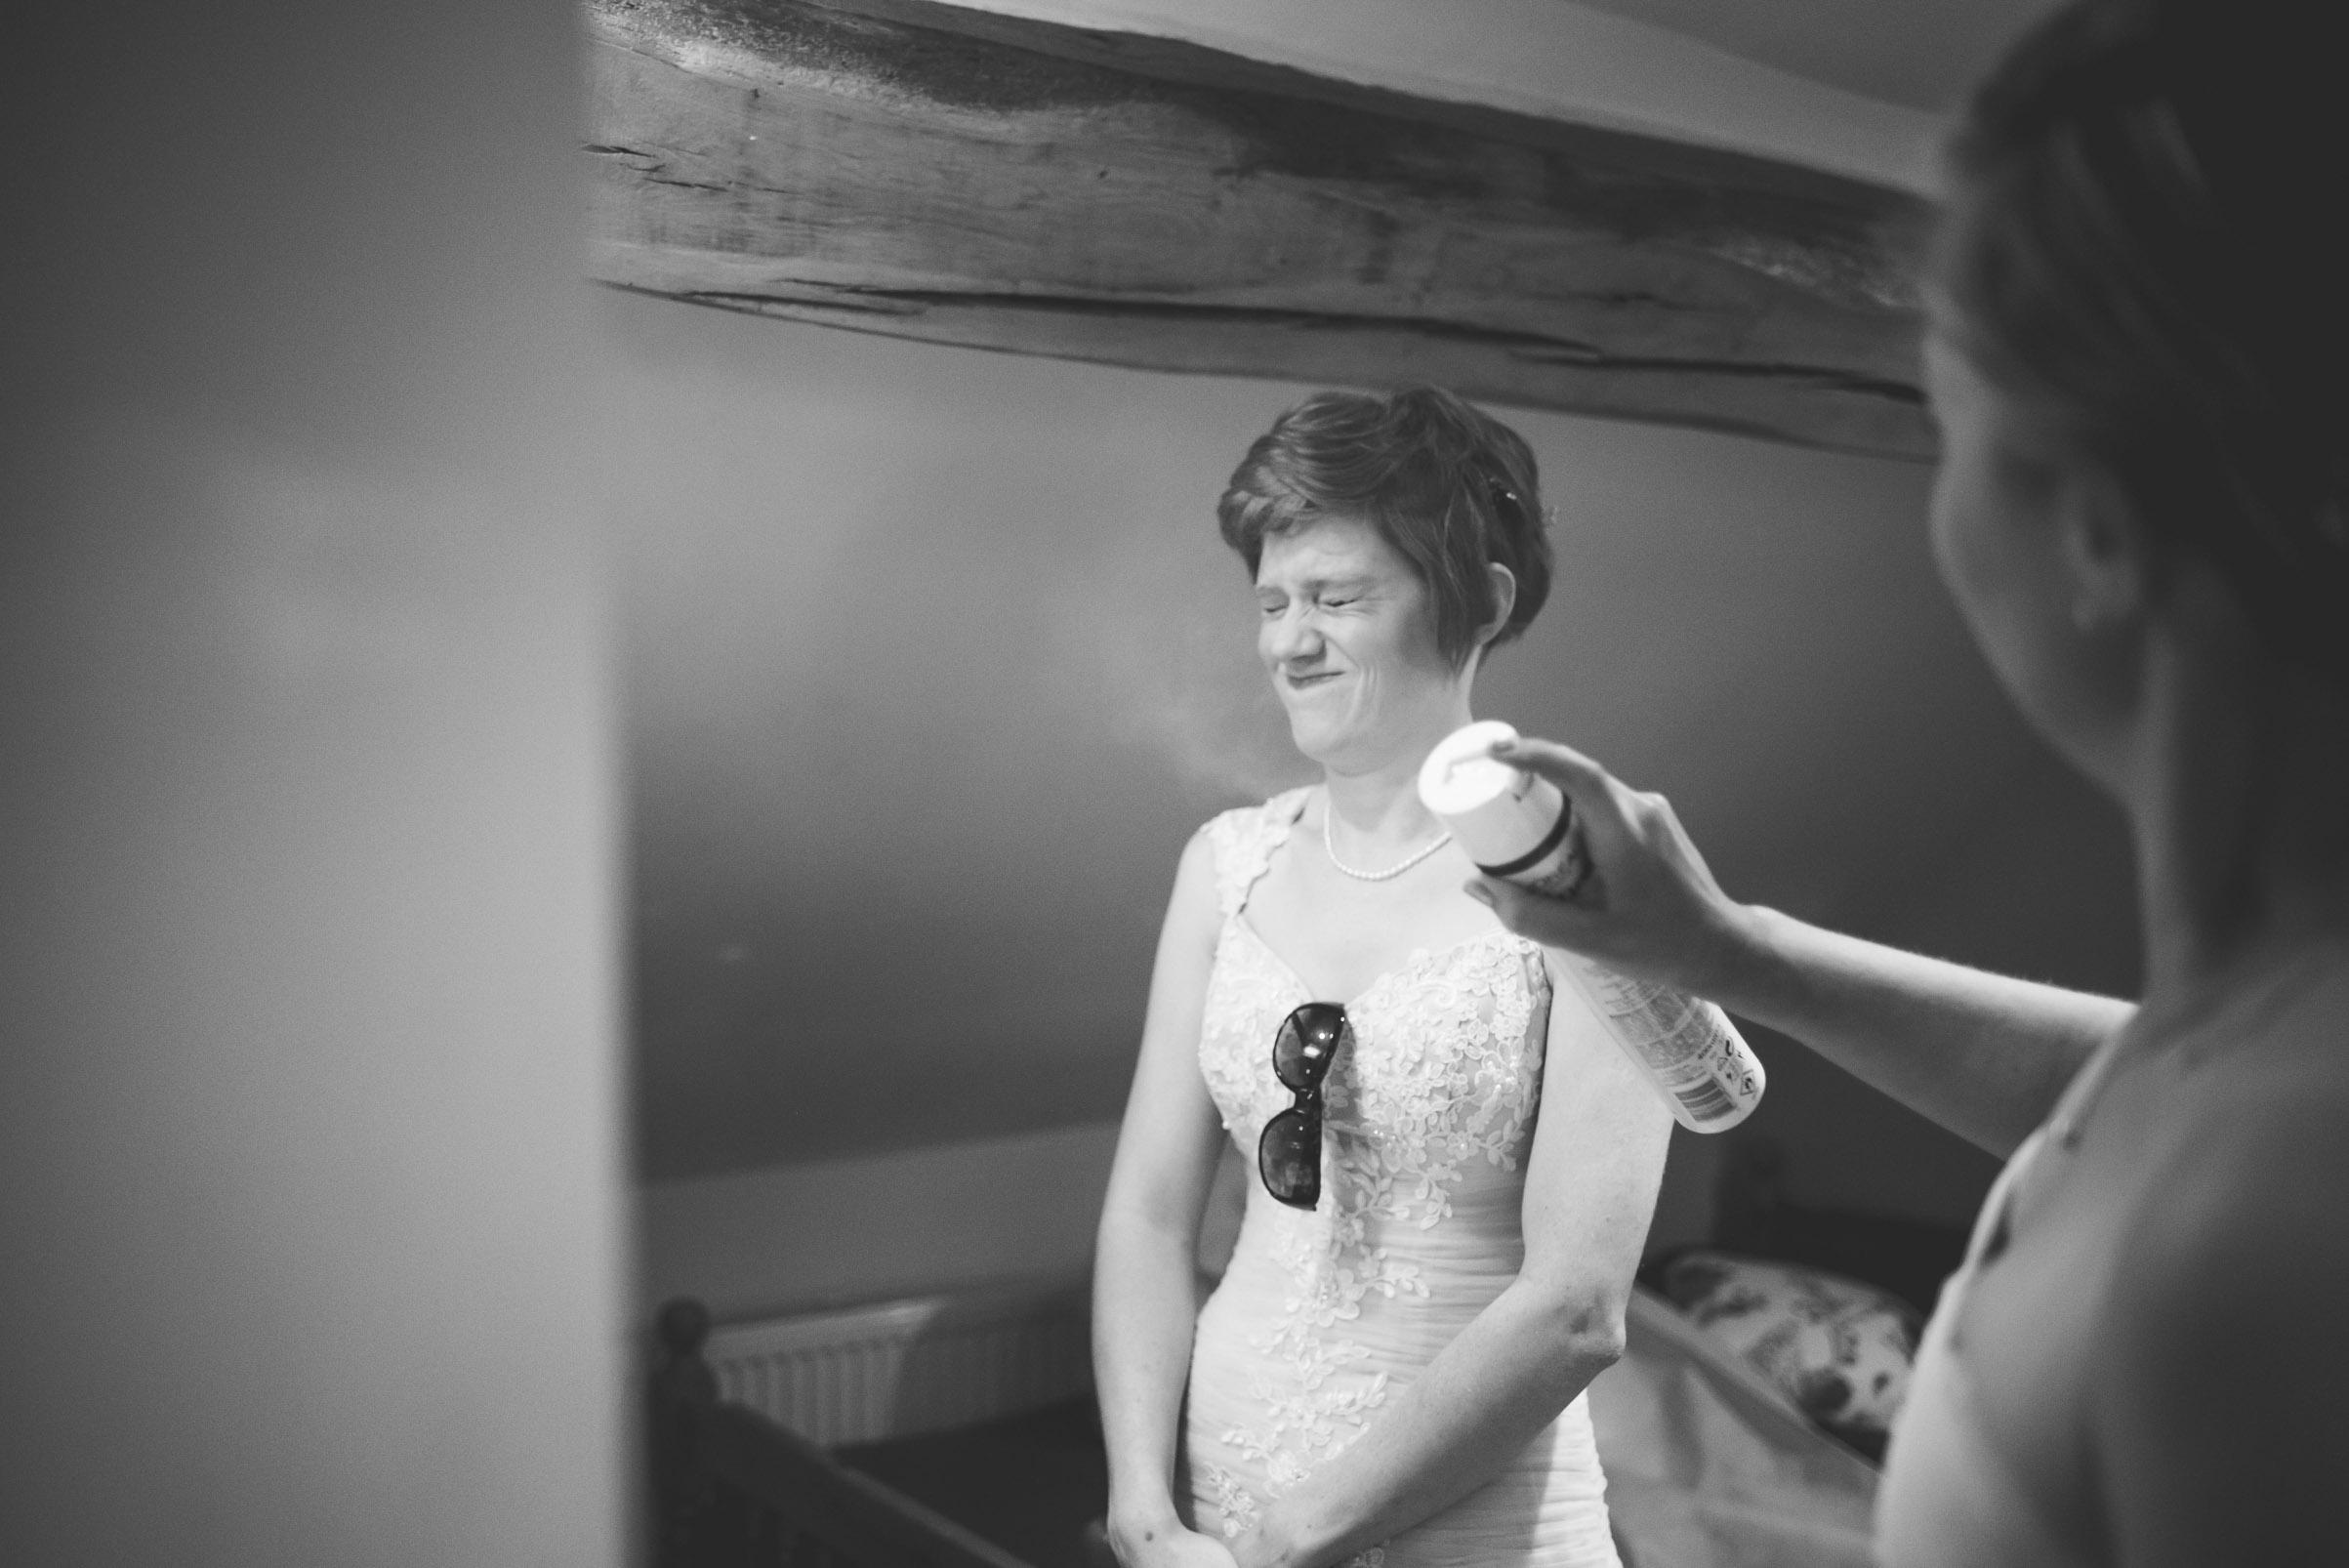 Peak+district+farm+wedding+lower+damgate+photographer-68.jpg